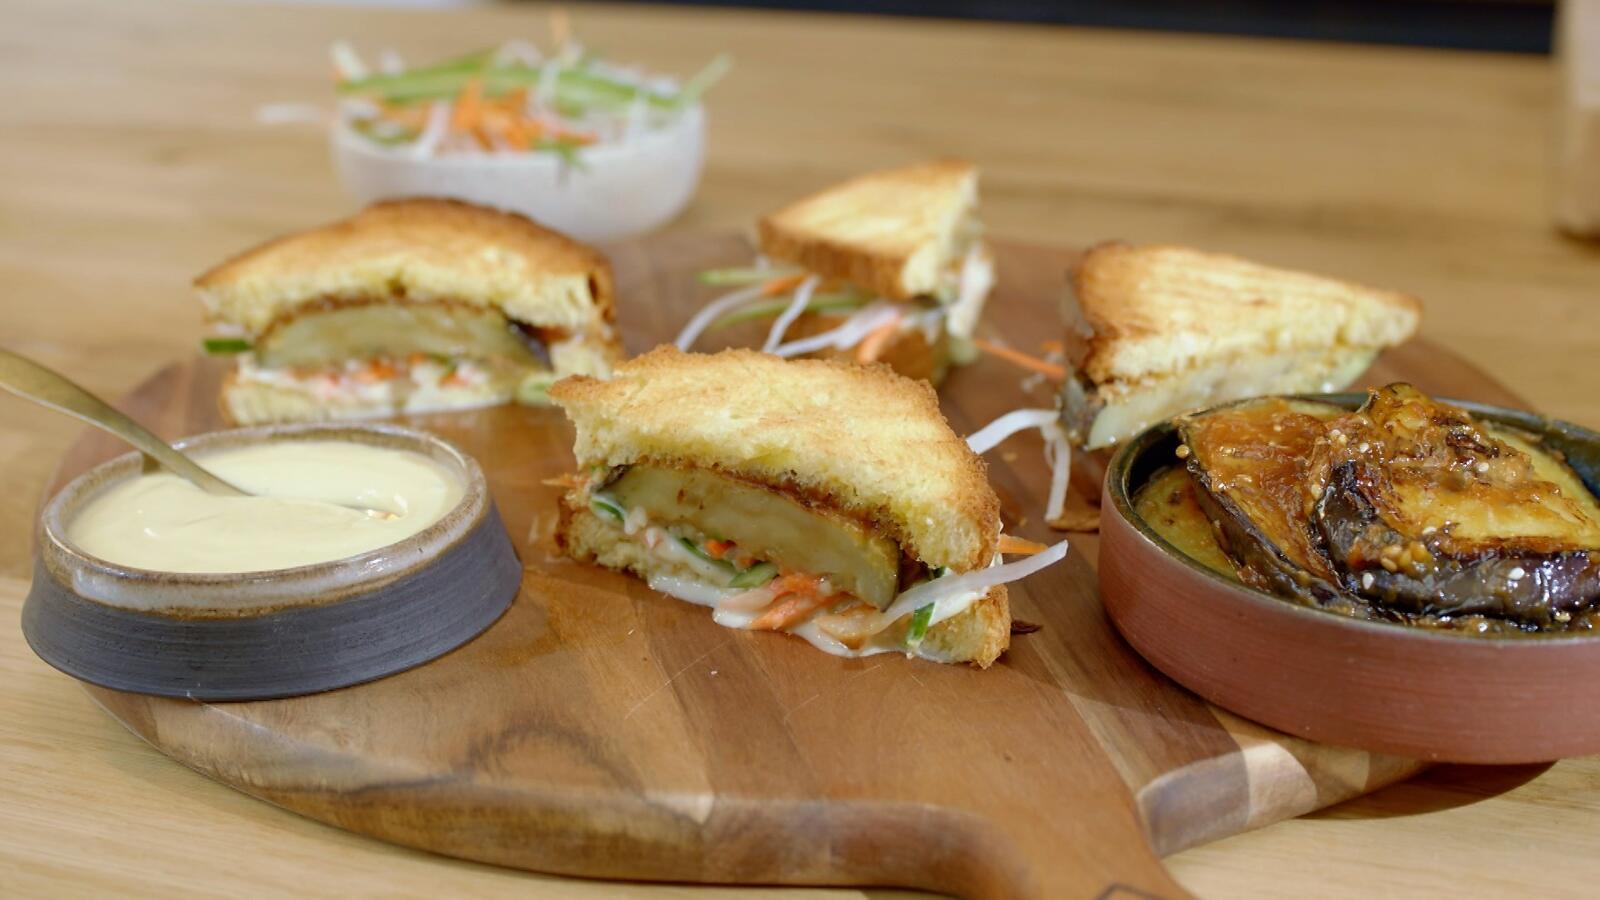 Japanse sandwich met aubergine, coleslaw en wasabidressing